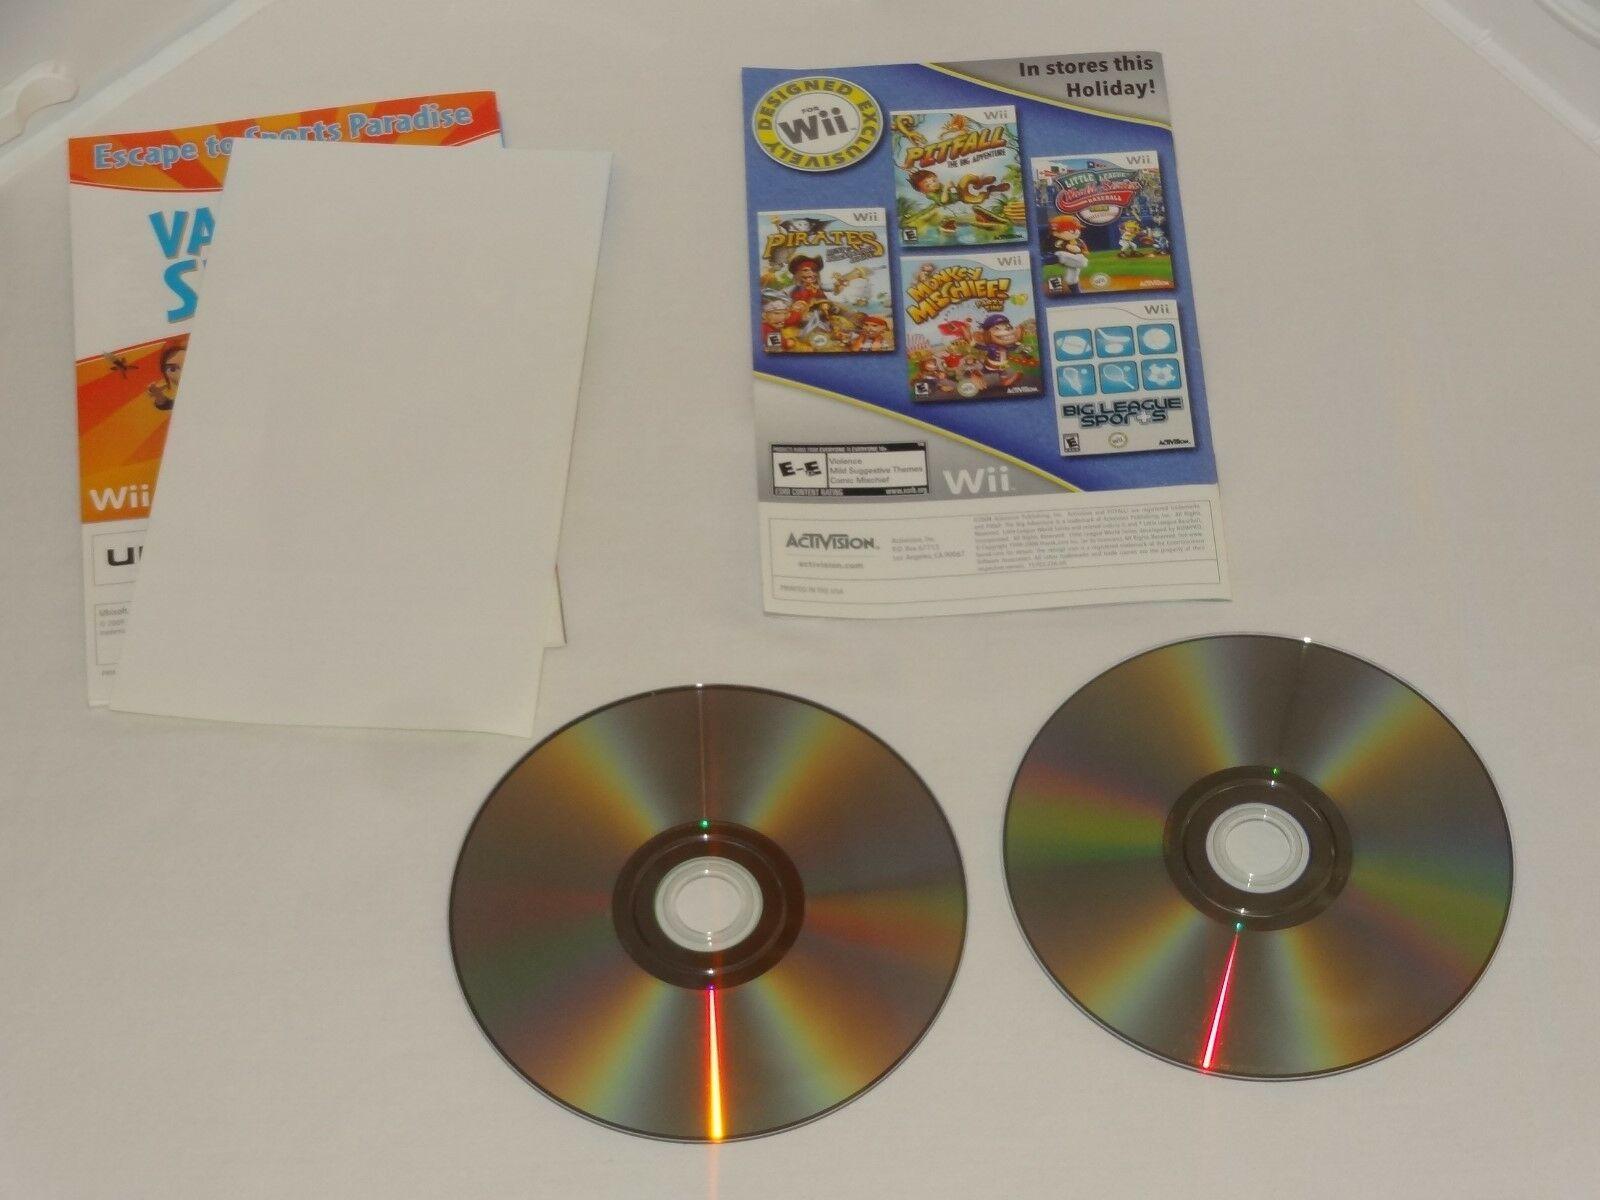 Six Flags Fun Park - Nintendo Wii UBI Soft + Block Party 20 Games Activision image 6